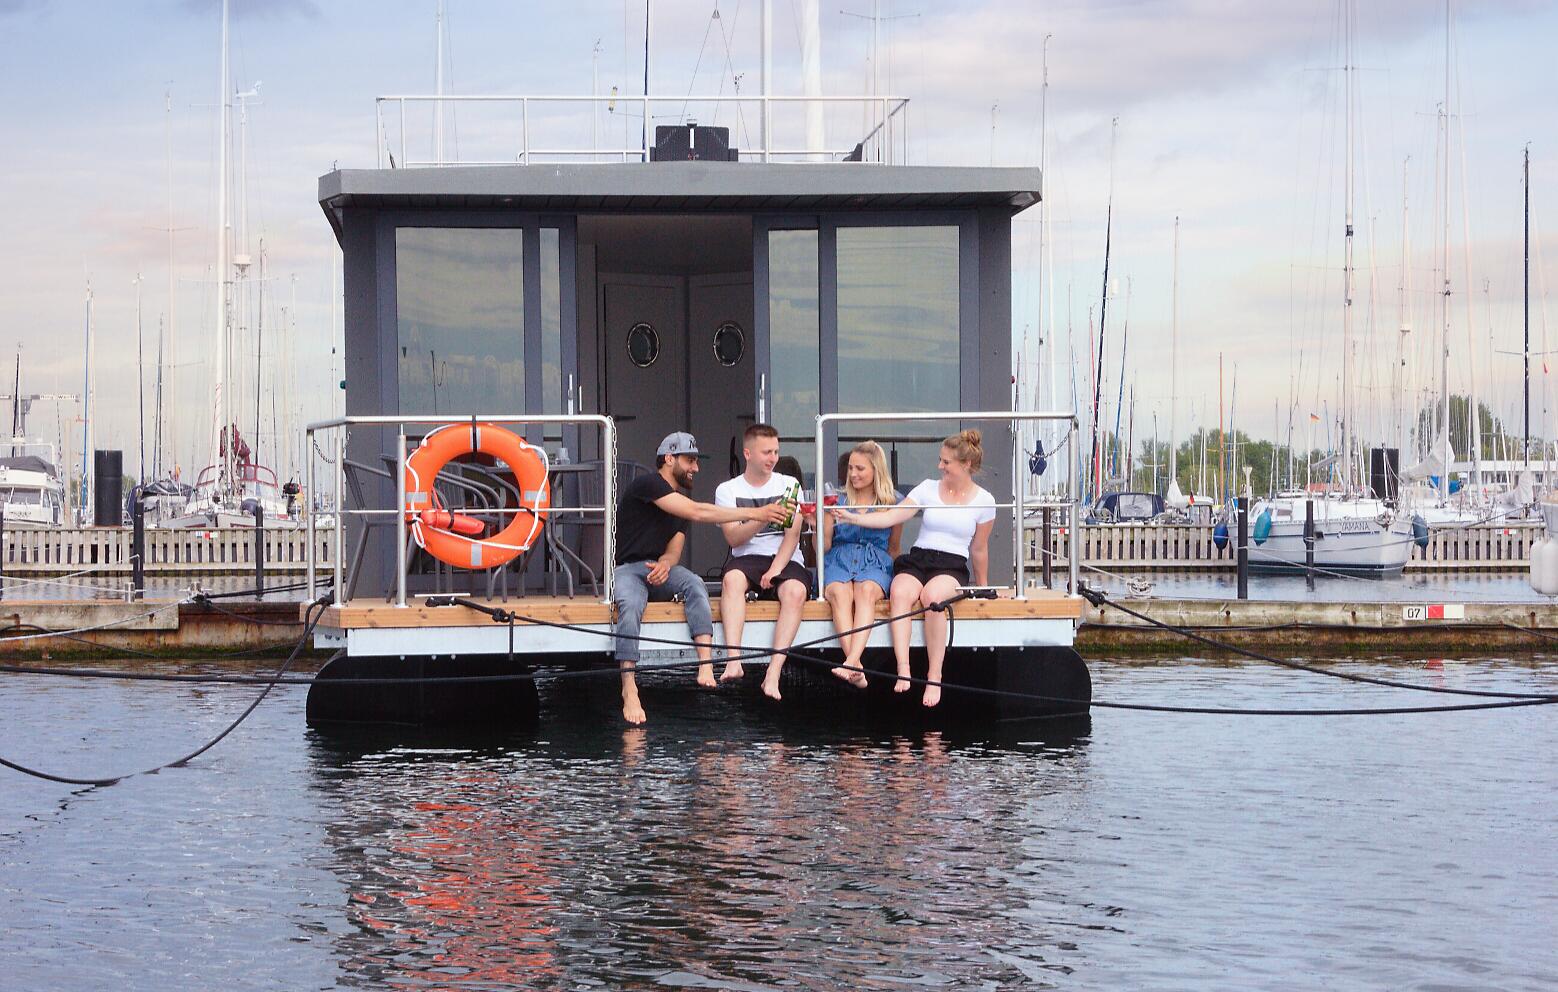 hausboot-uebernachtung-wendtorf-bg4